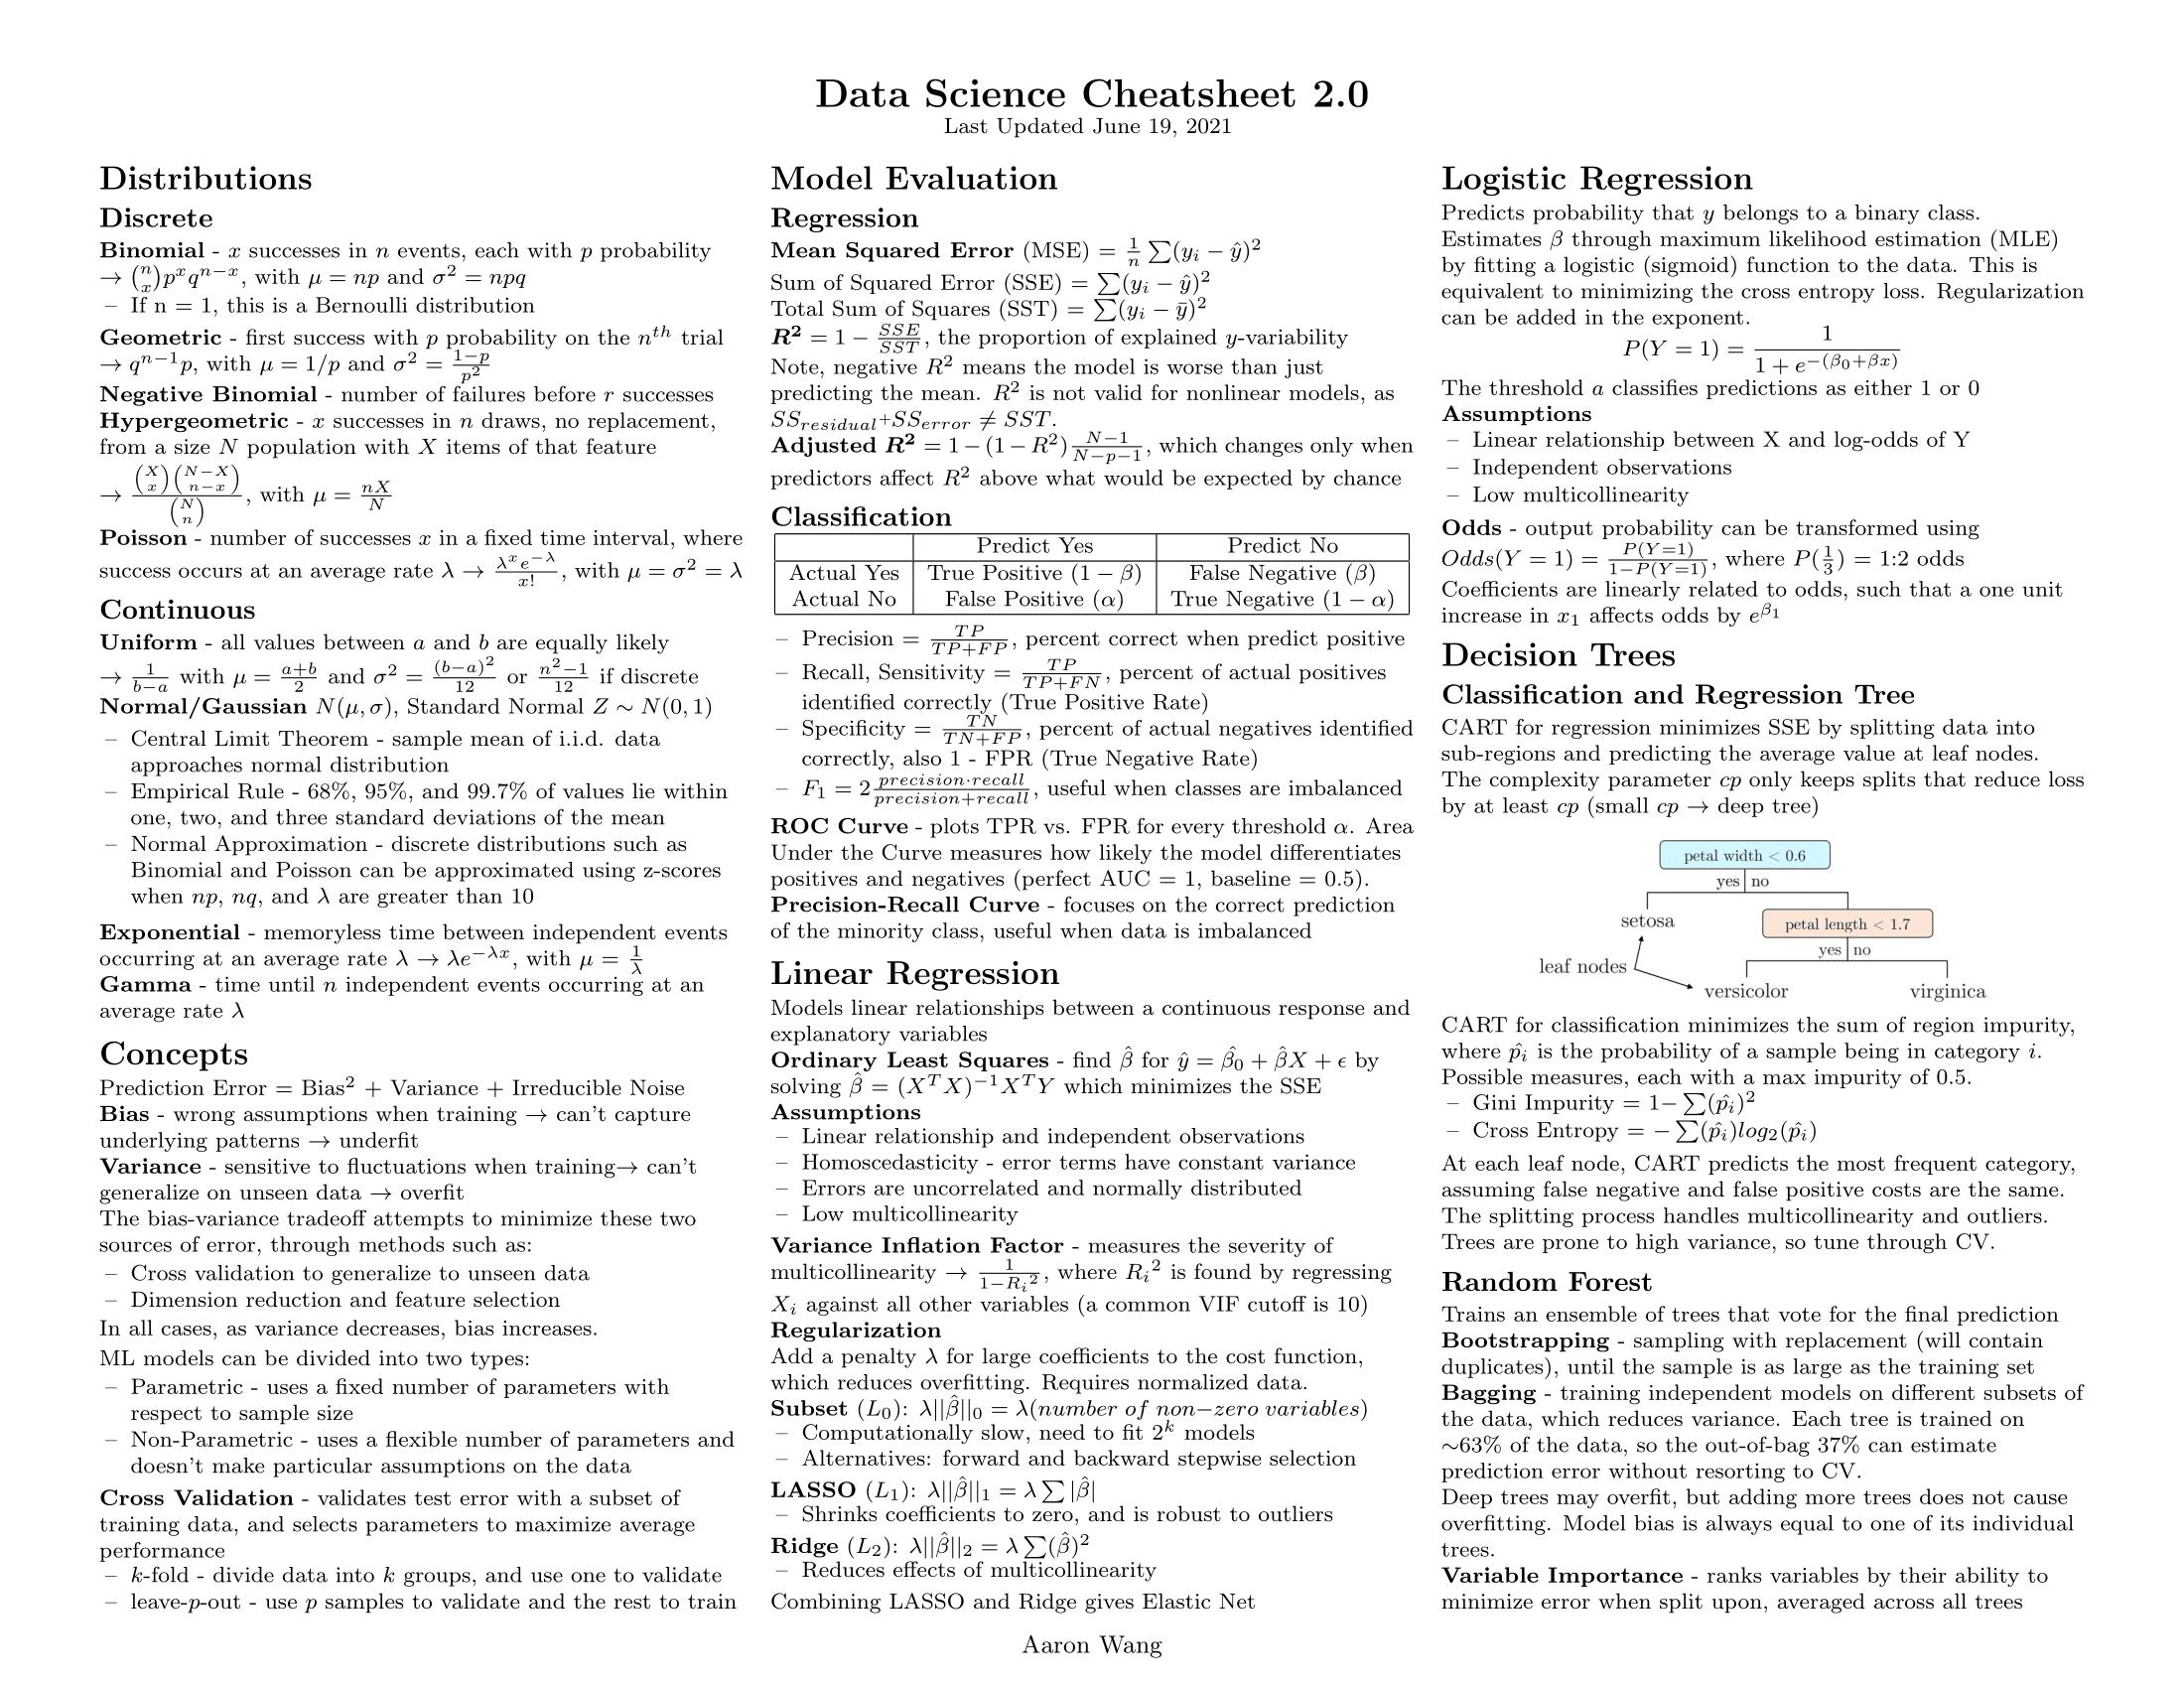 Data Science Cheat Sheet PDF